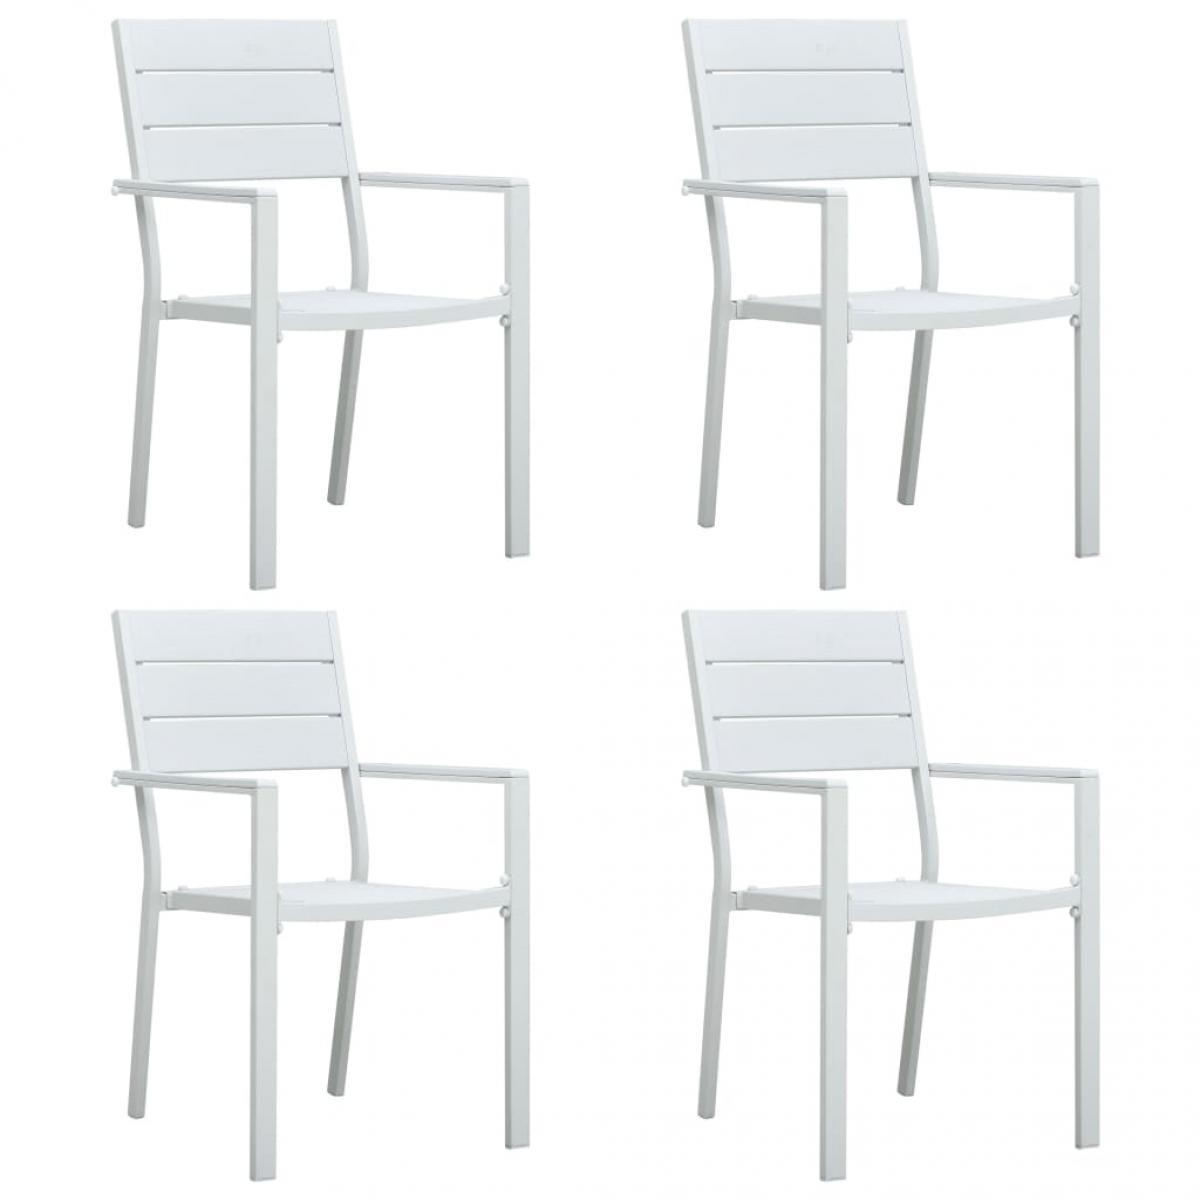 Vidaxl vidaXL Chaises de jardin 4 pcs Blanc PEHD Aspect de bois